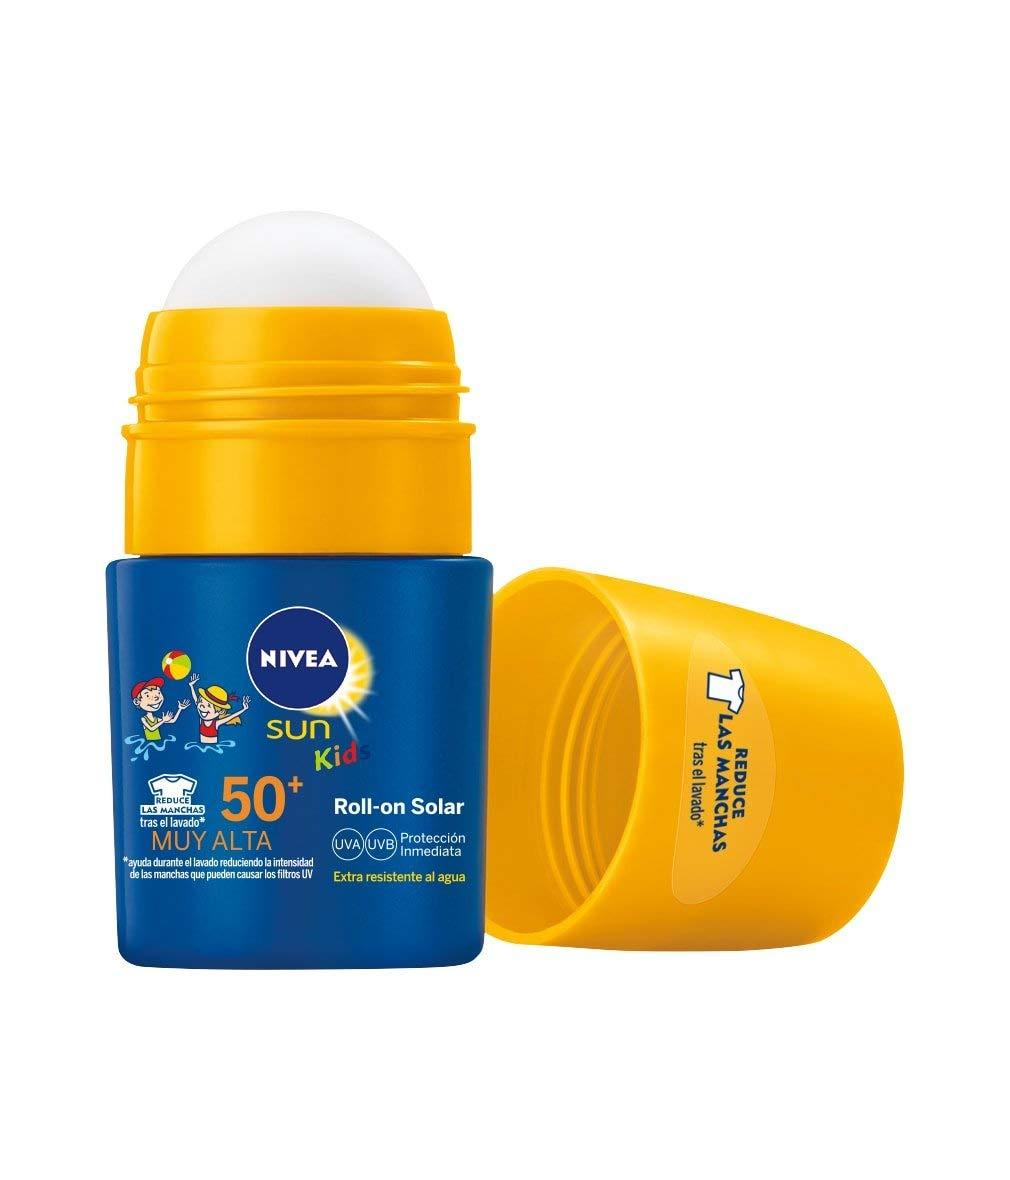 NIVEA SUN Roll-On Solar Niños Protege & Juega FP50+ (1 x 50 ml), protector solar roll-on para niños, crema solar…